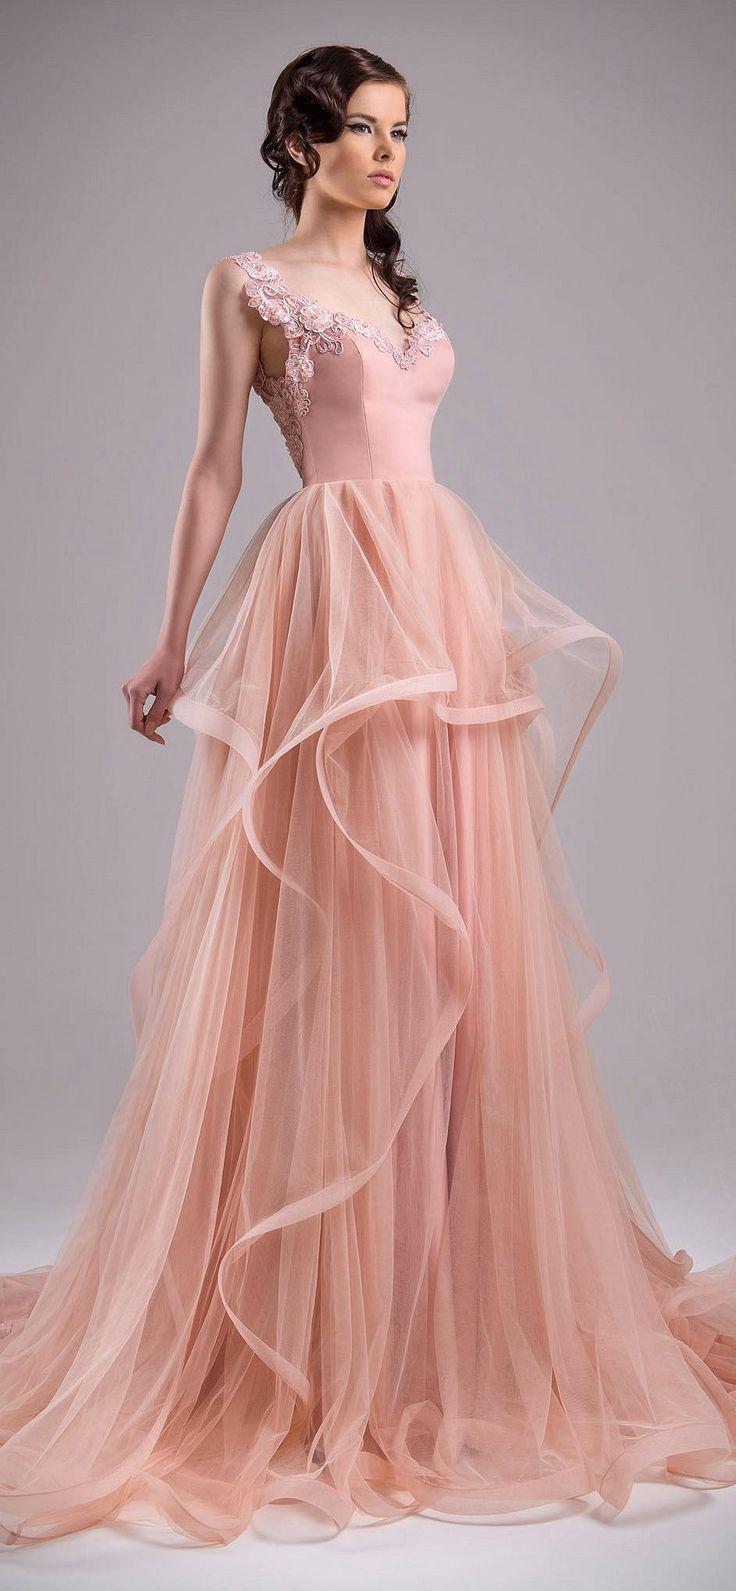 12 best Женская мода images on Pinterest | Party wear dresses ...